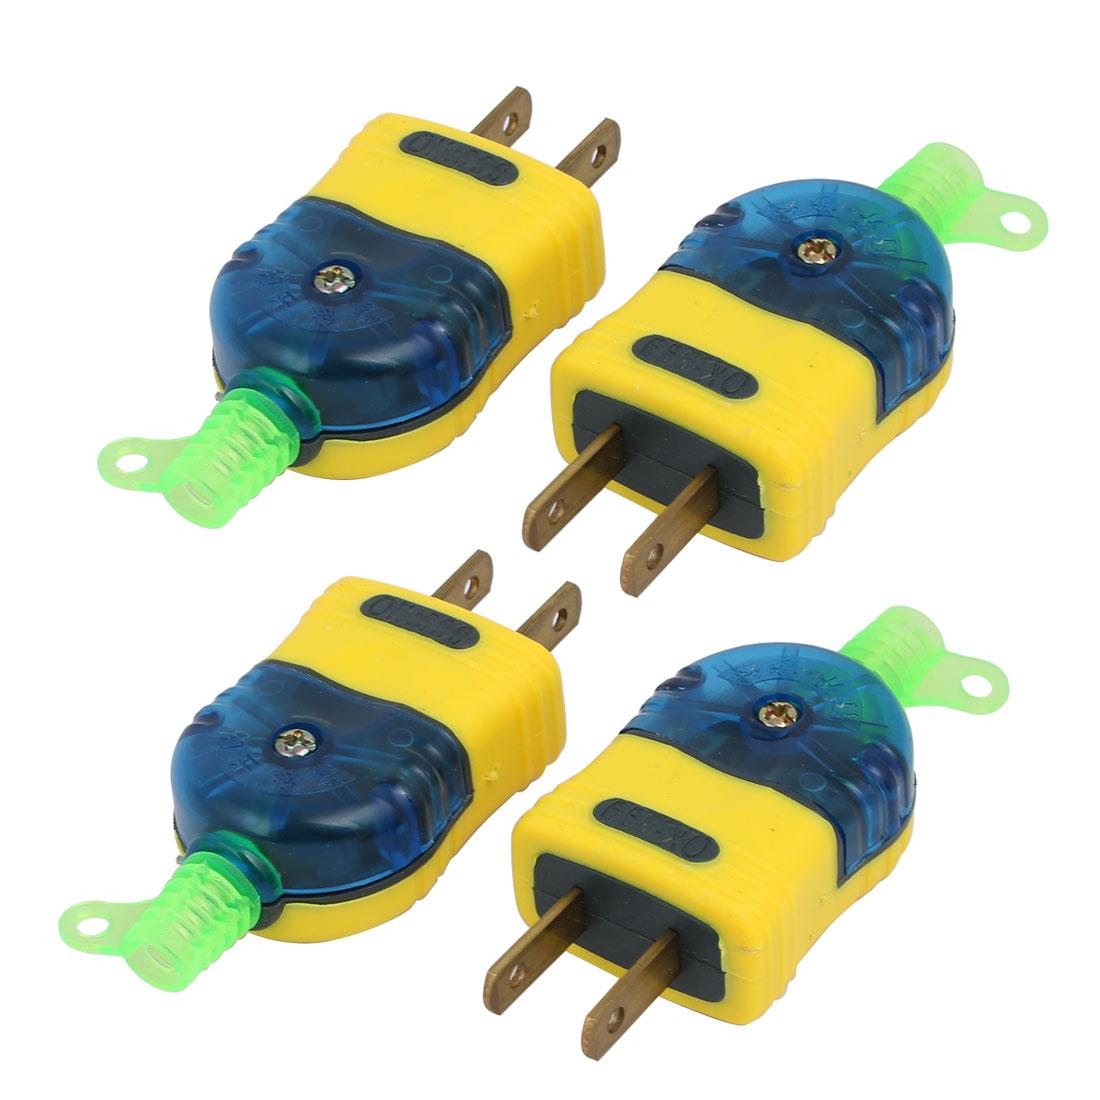 4pcs Blue Yellow Housing 2 Pin Power Adapter 250V 16A 400W US AU Plug